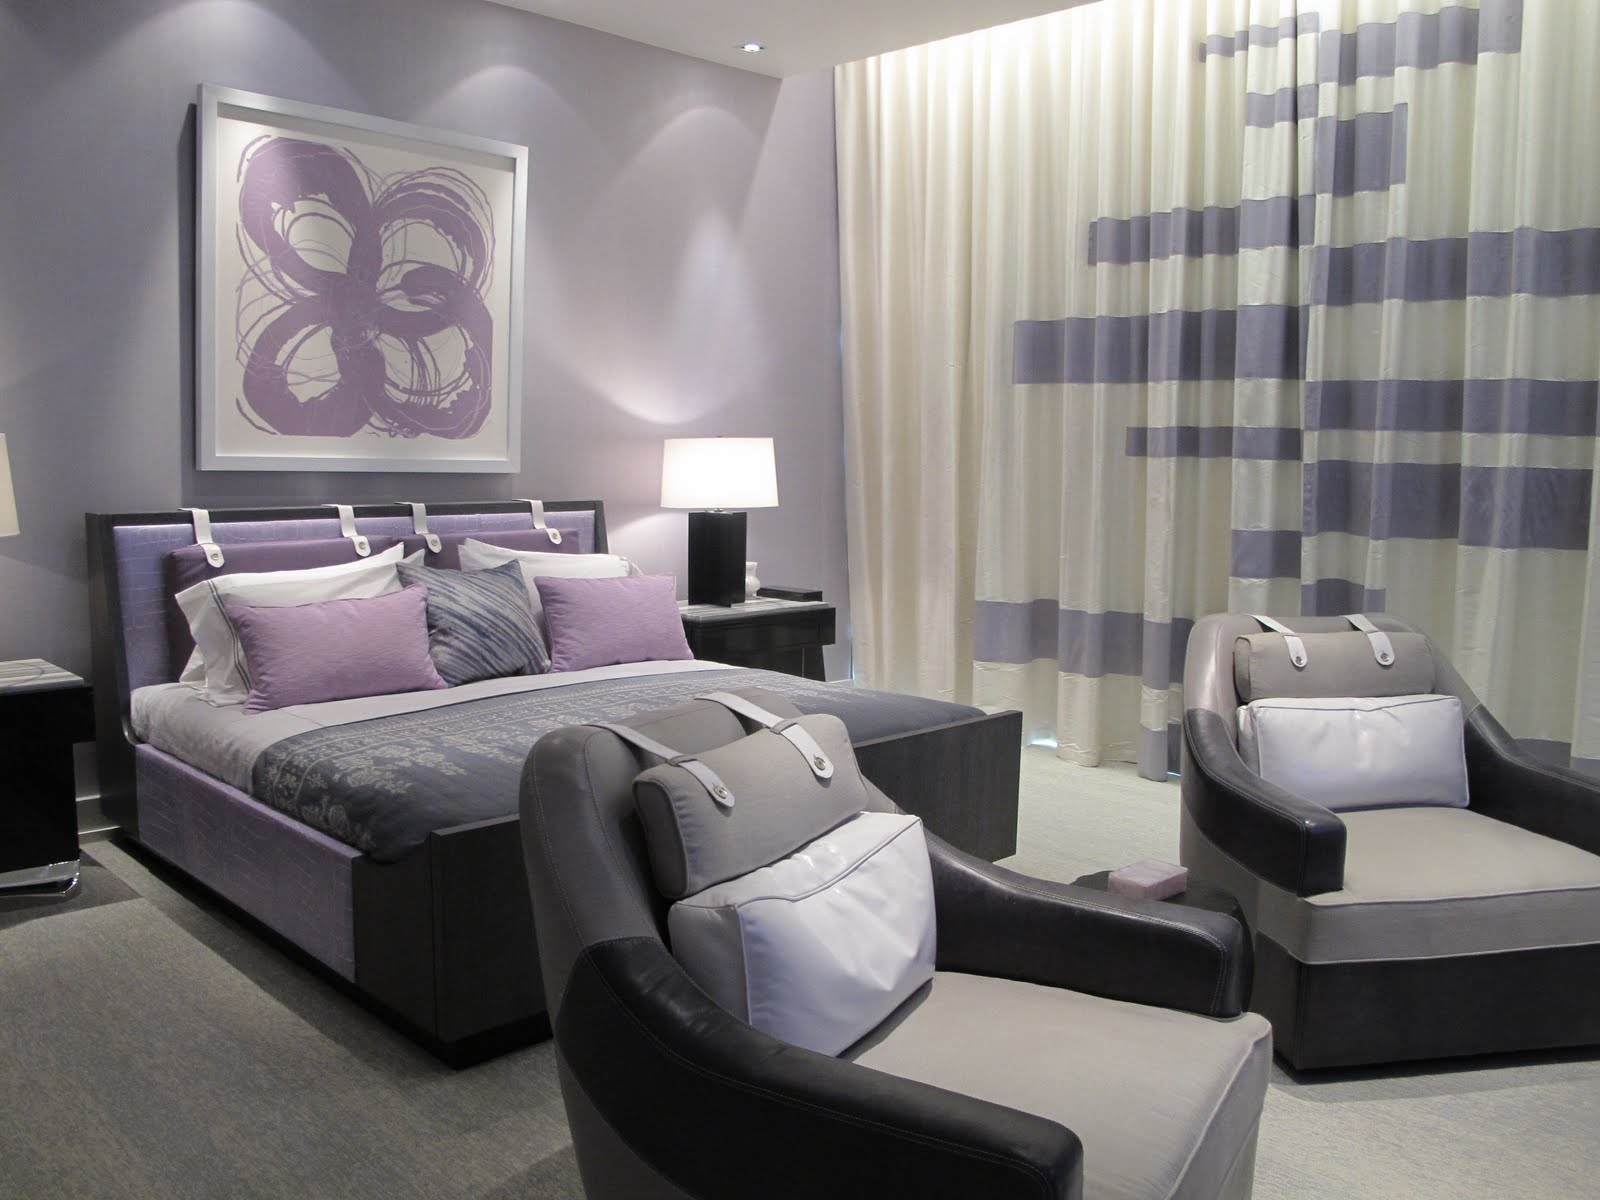 room ideas master bedroom 10 David Collins Master Bedroom Ideas IMG 4210